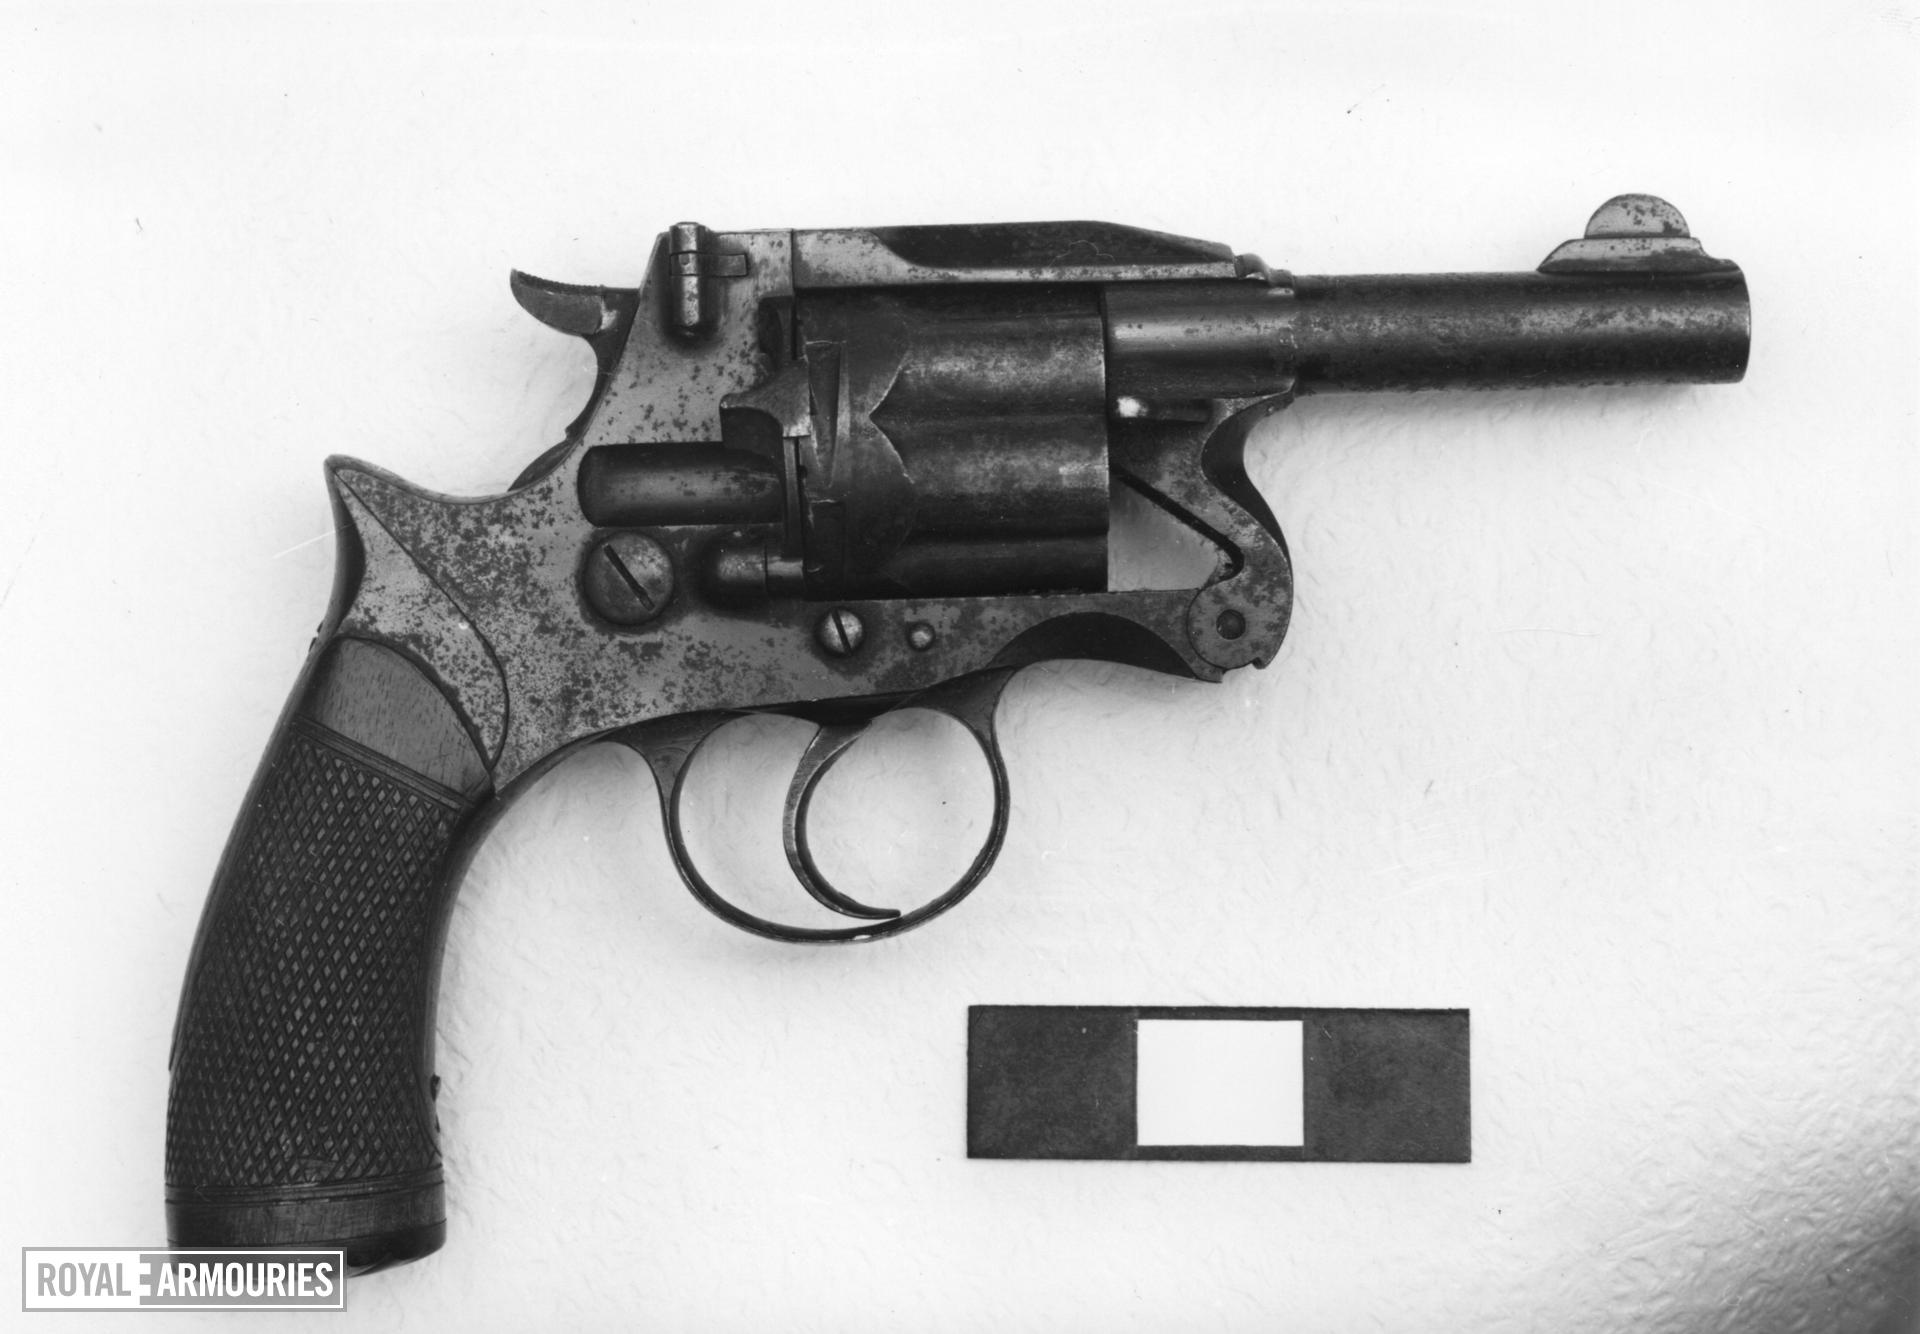 Centrefire six-shot revolver - Enfield Mk.I